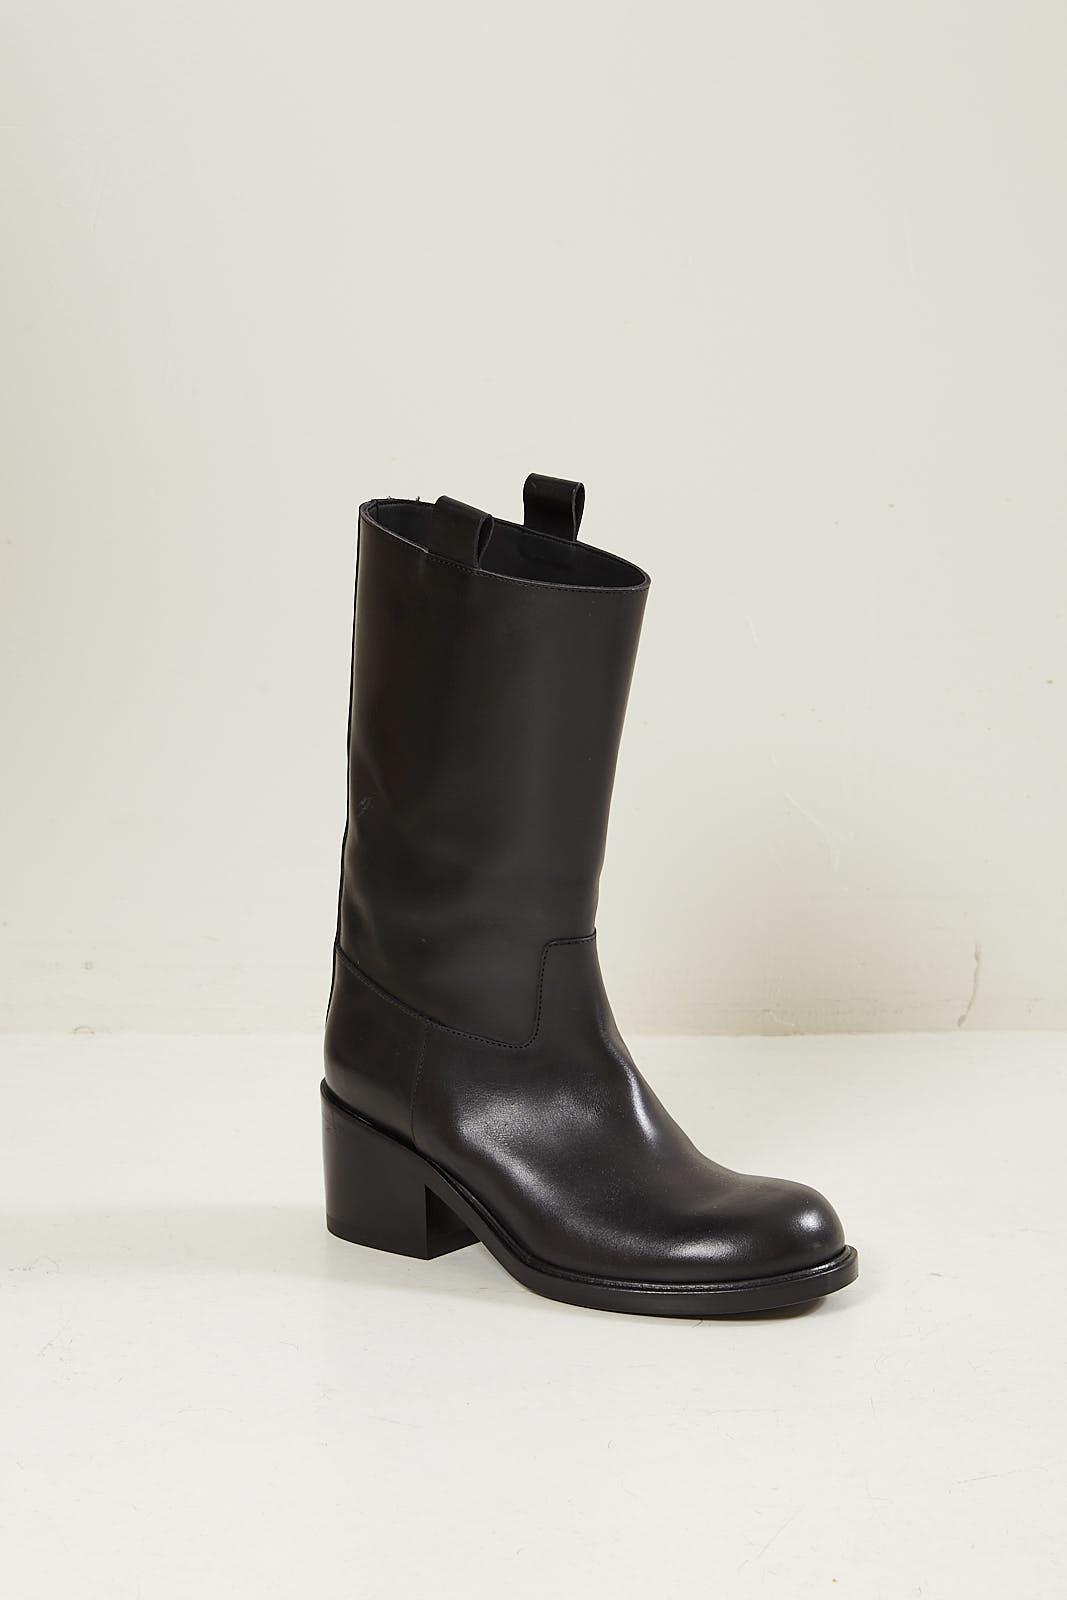 A.F. Vandevorst Low boots